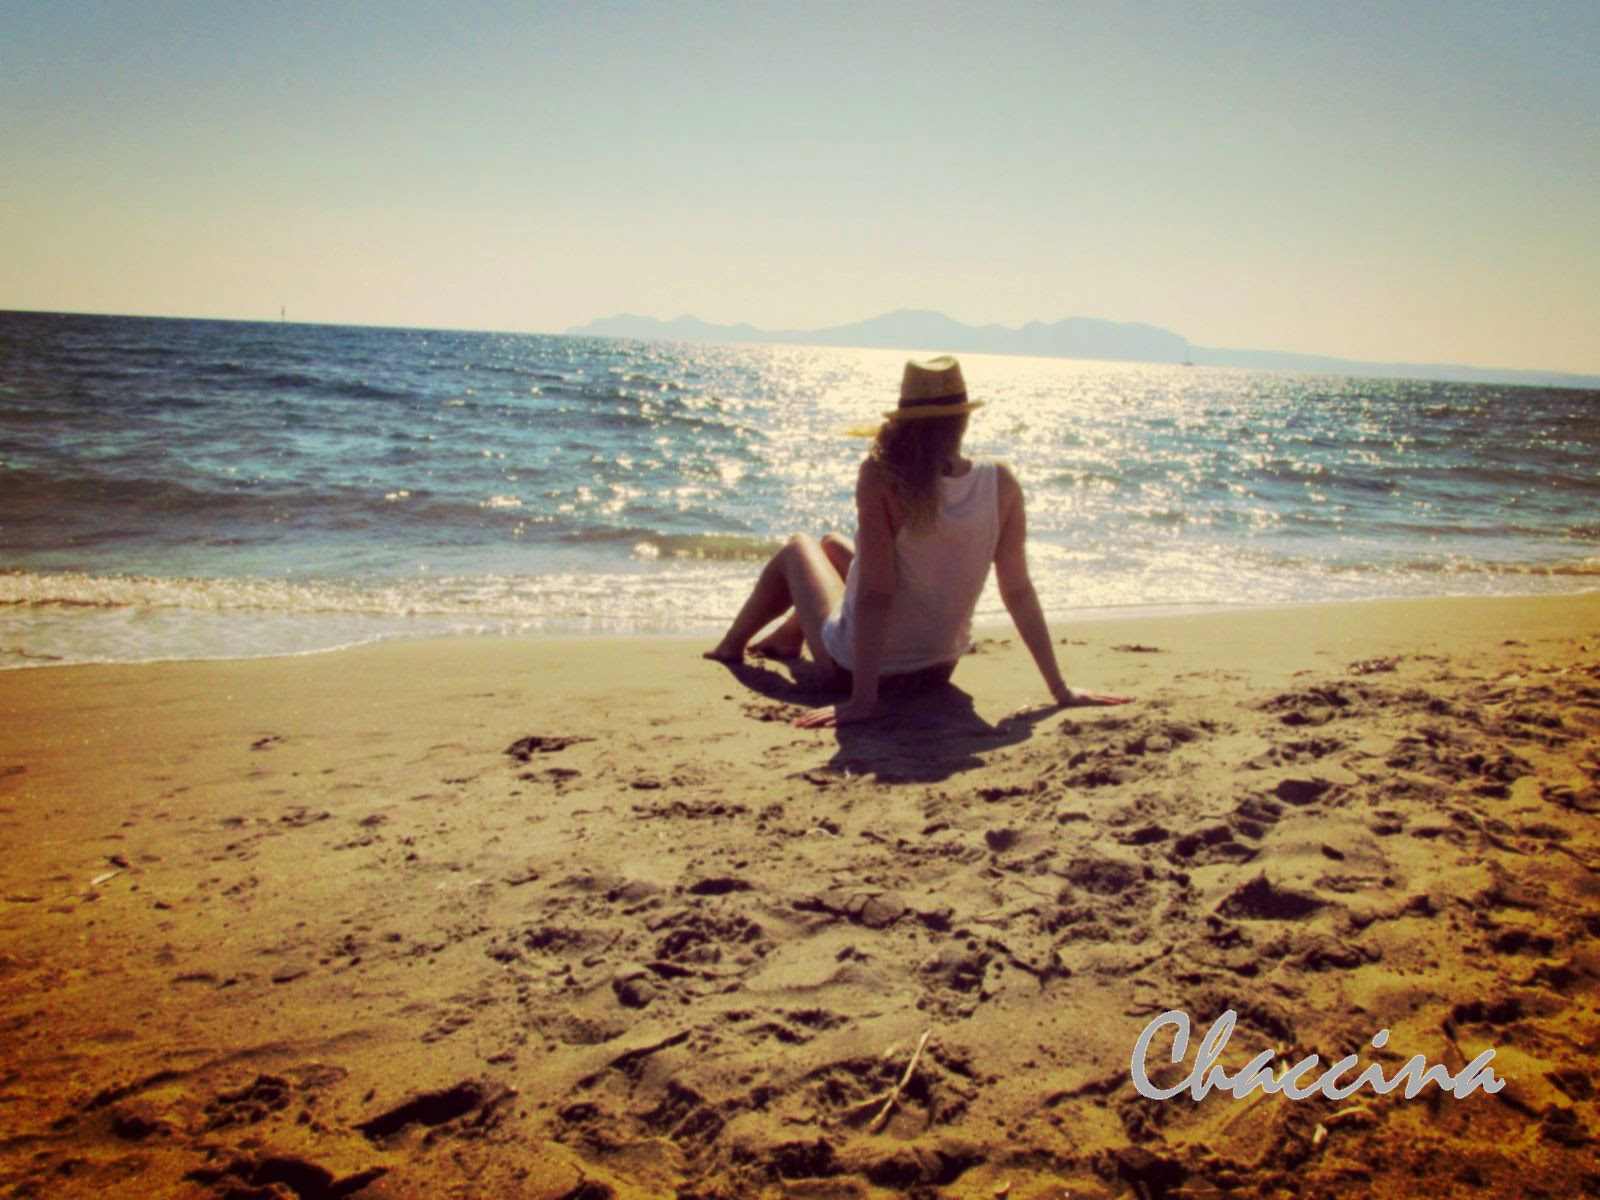 Urlaub auf Kos / Chaccina Lifestyleblog